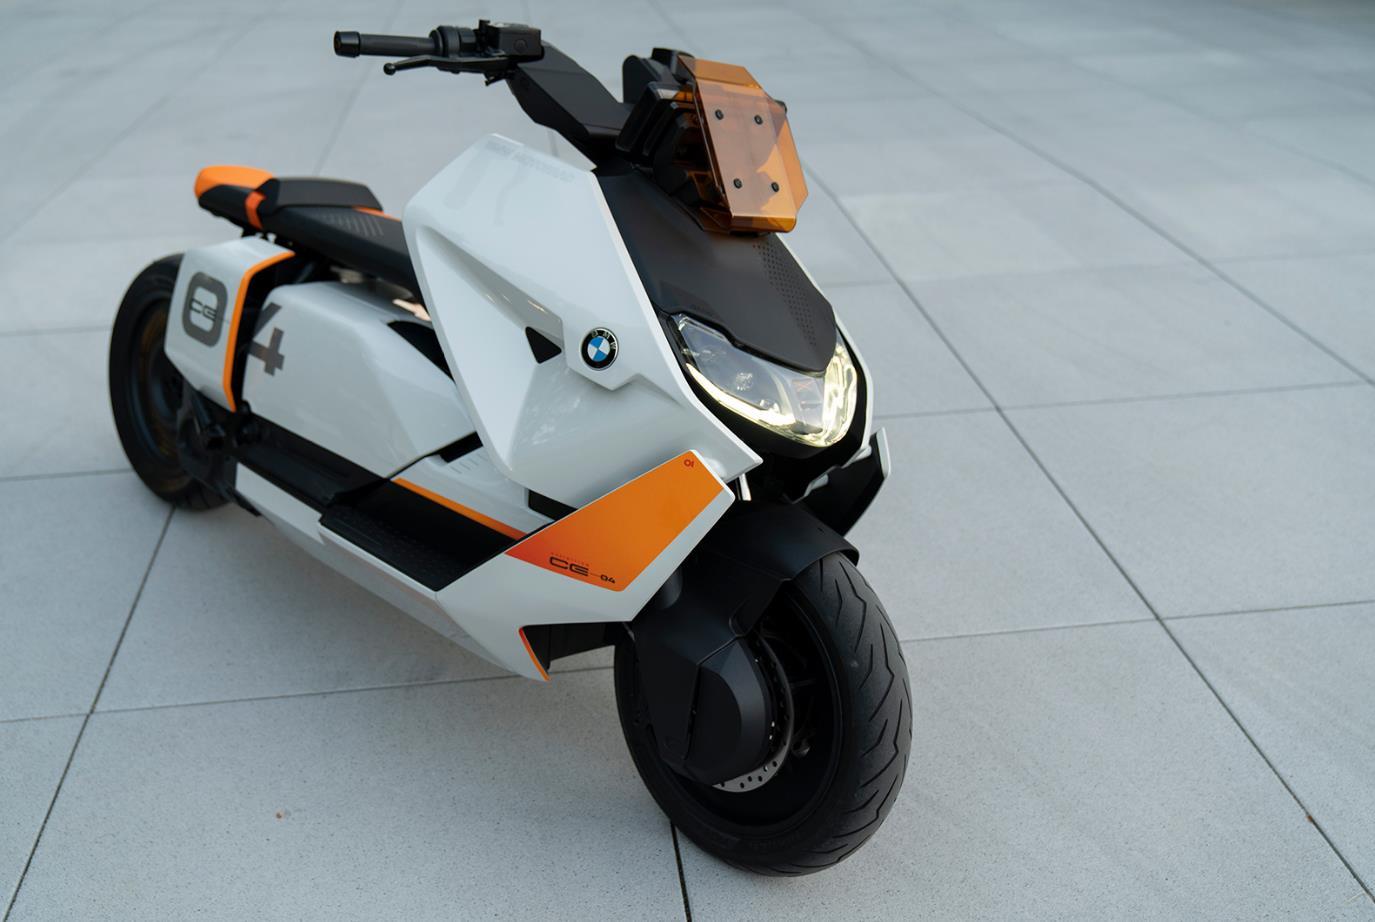 0BMW Motorrad Definition CE 04概念车.jpg